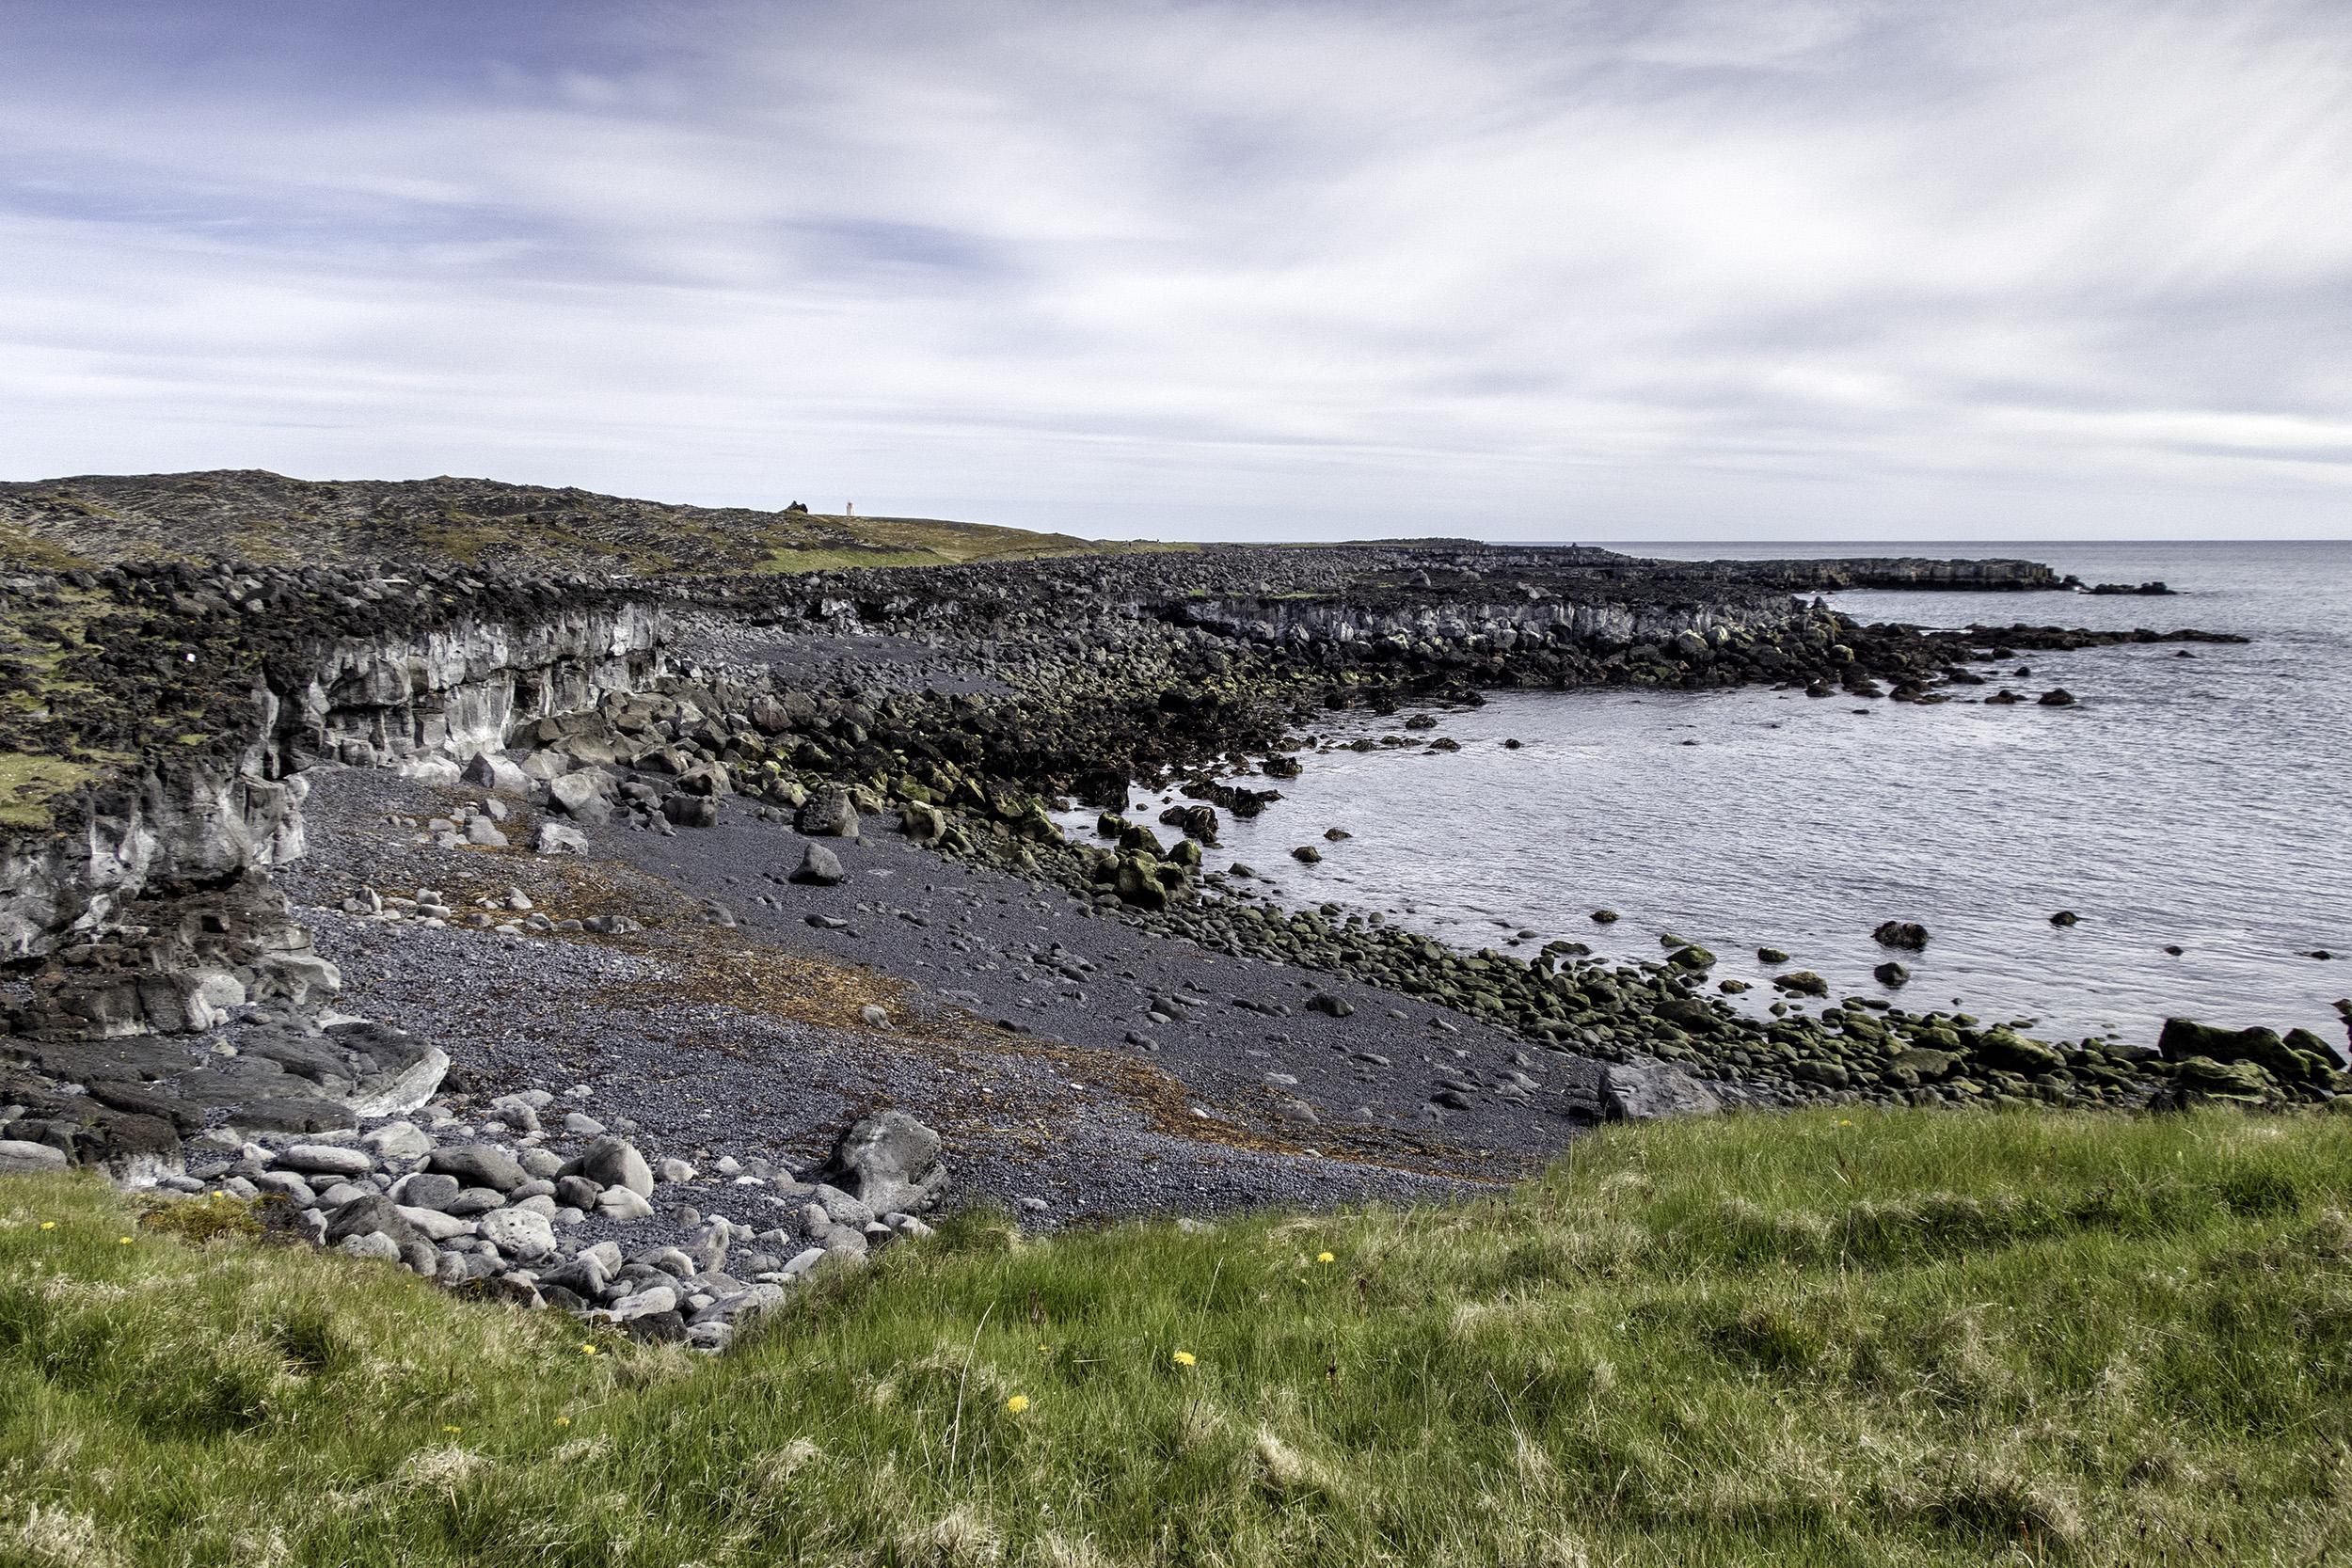 The Snaefells Peninsula